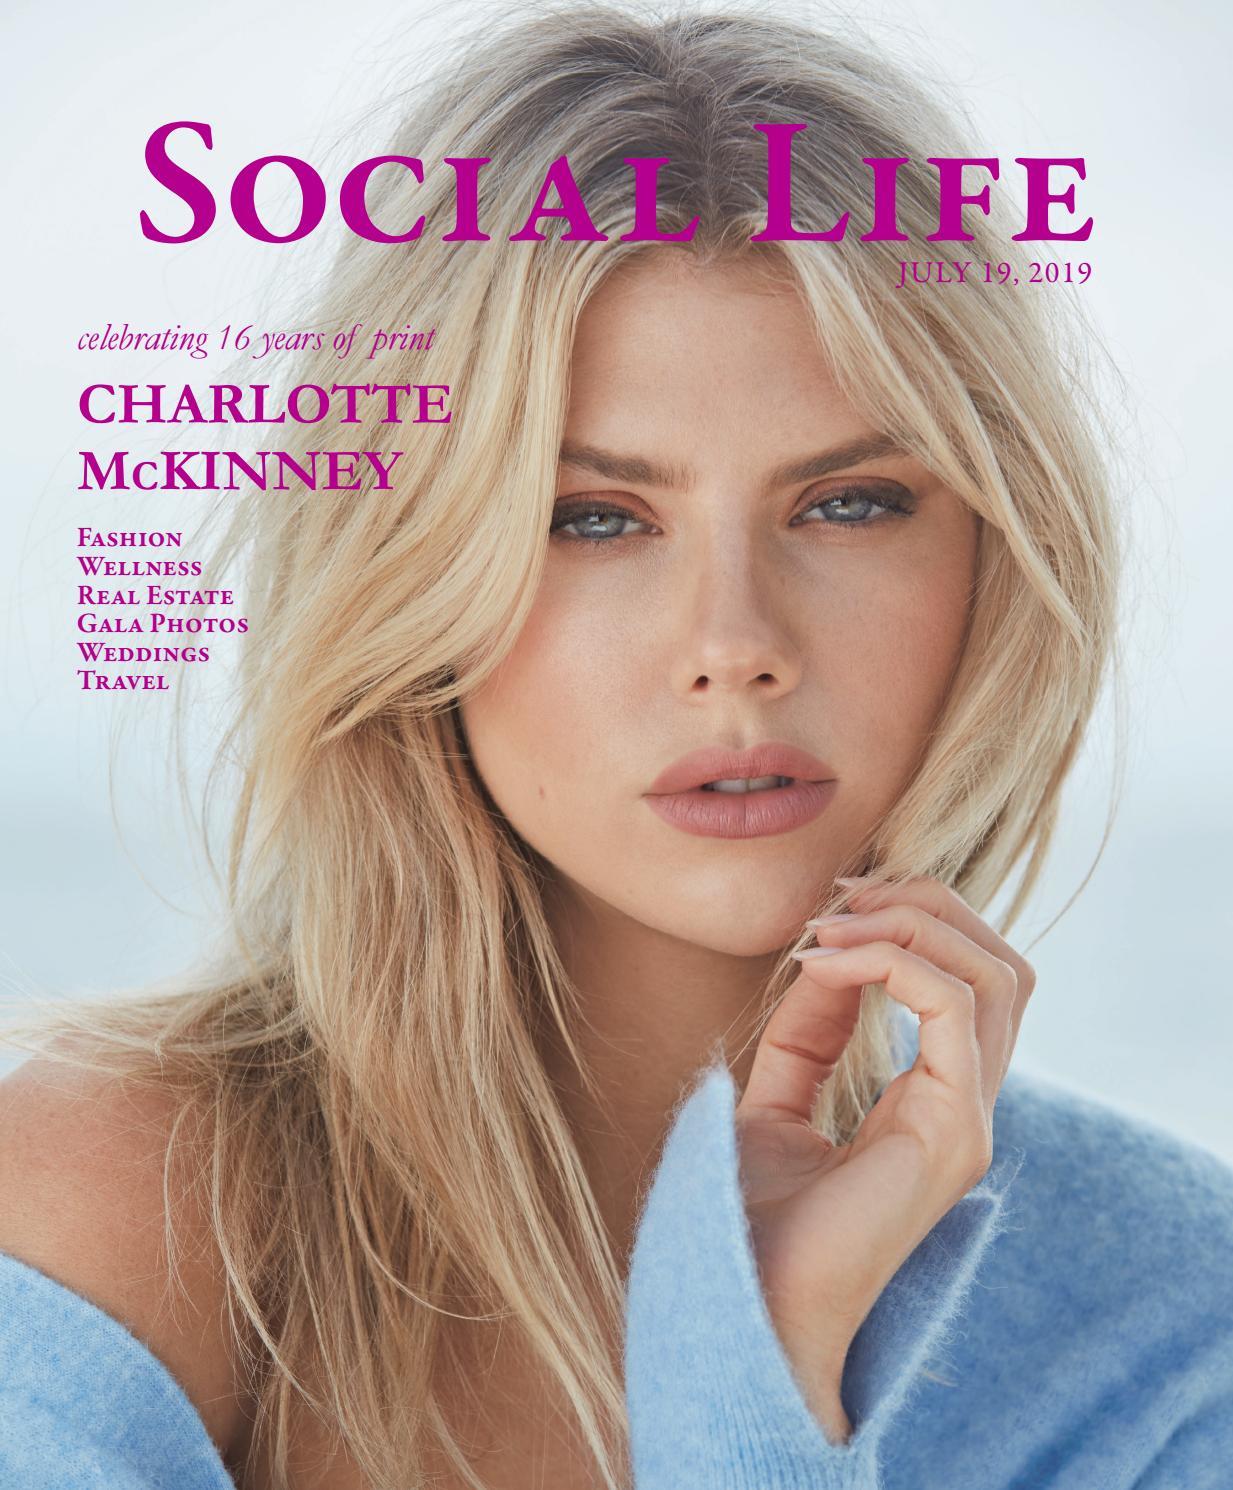 Social Life - July 19 2019 - Charlotte McKinney by Social